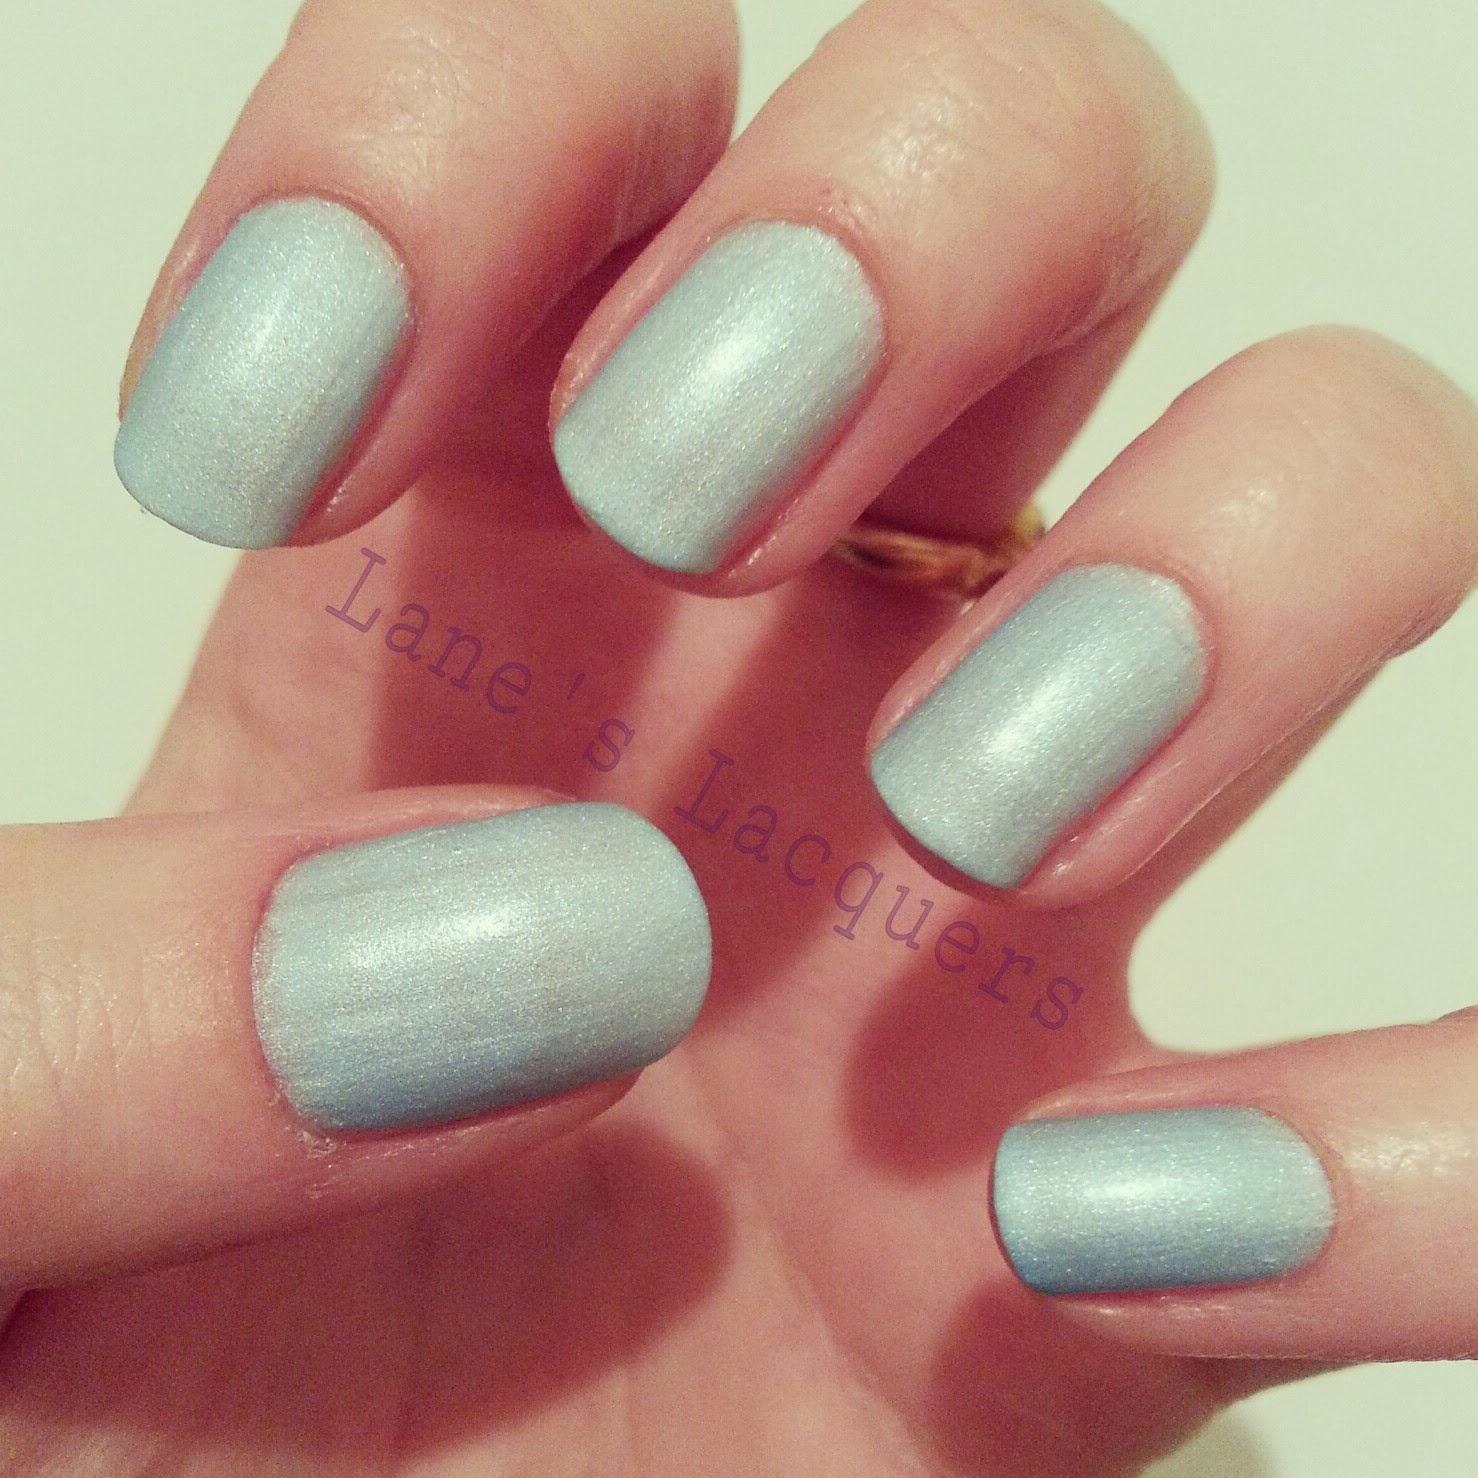 barry-m-silk-mist-swatch-manicure